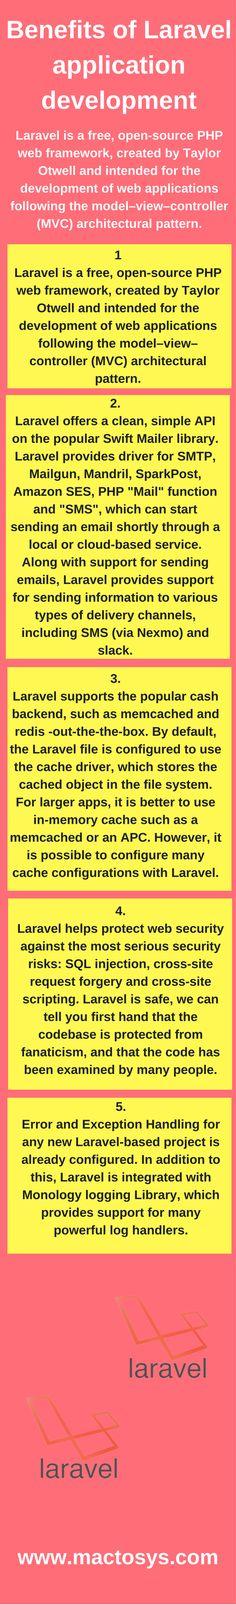 benefits of laravel application development